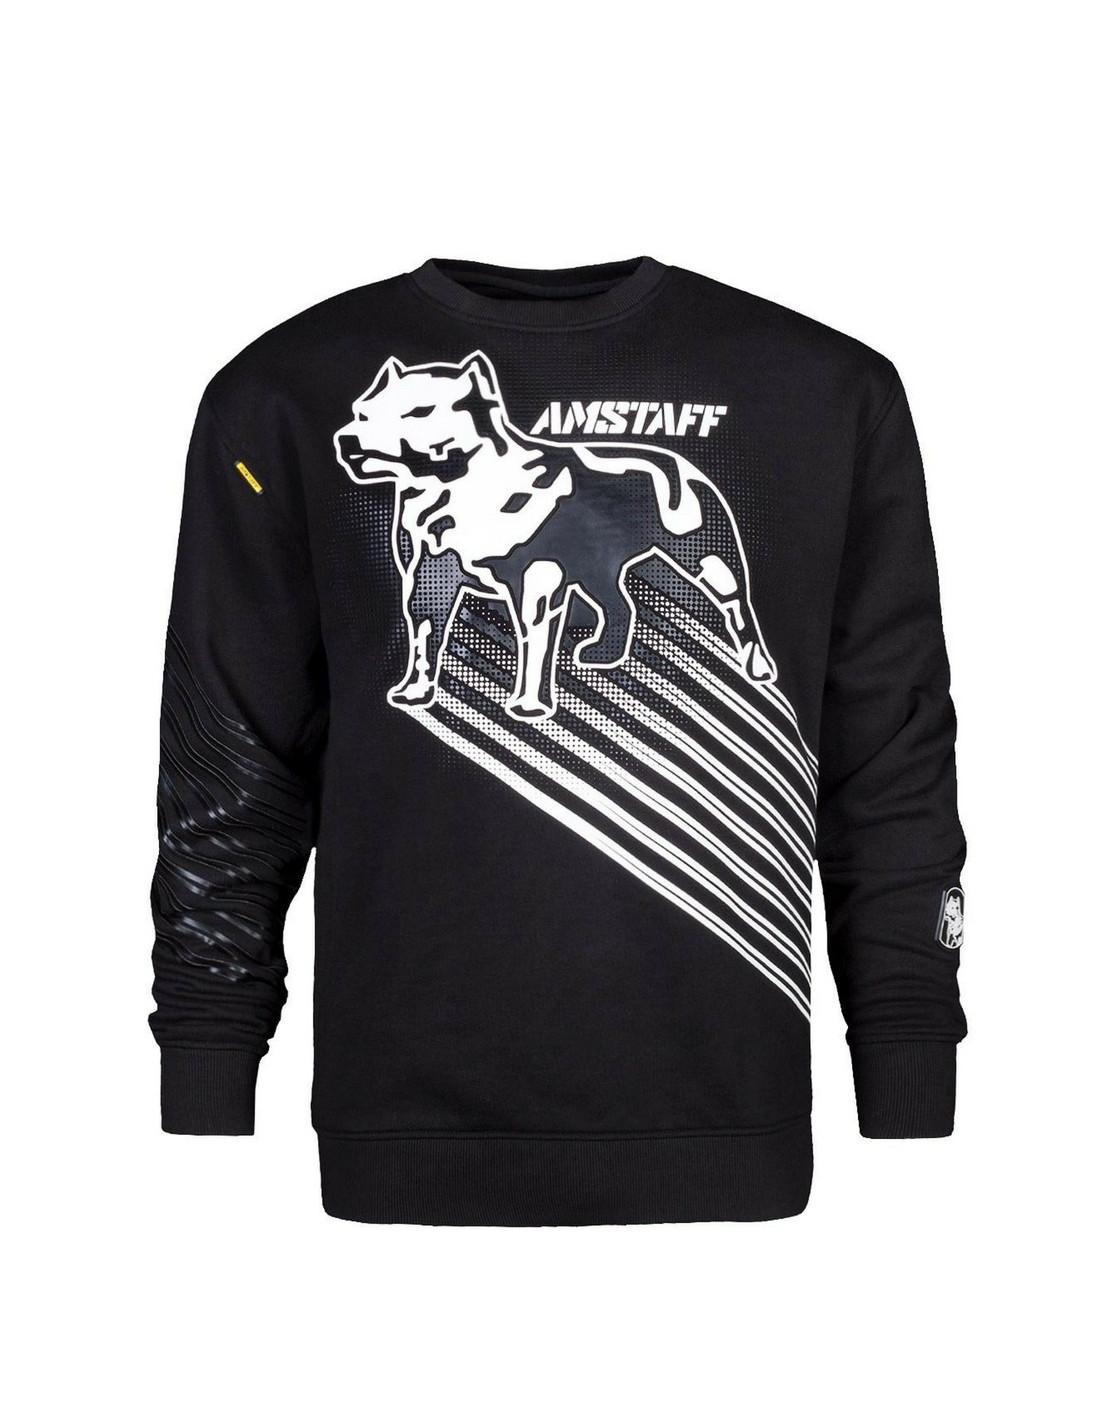 Amstaff Irex Sweater